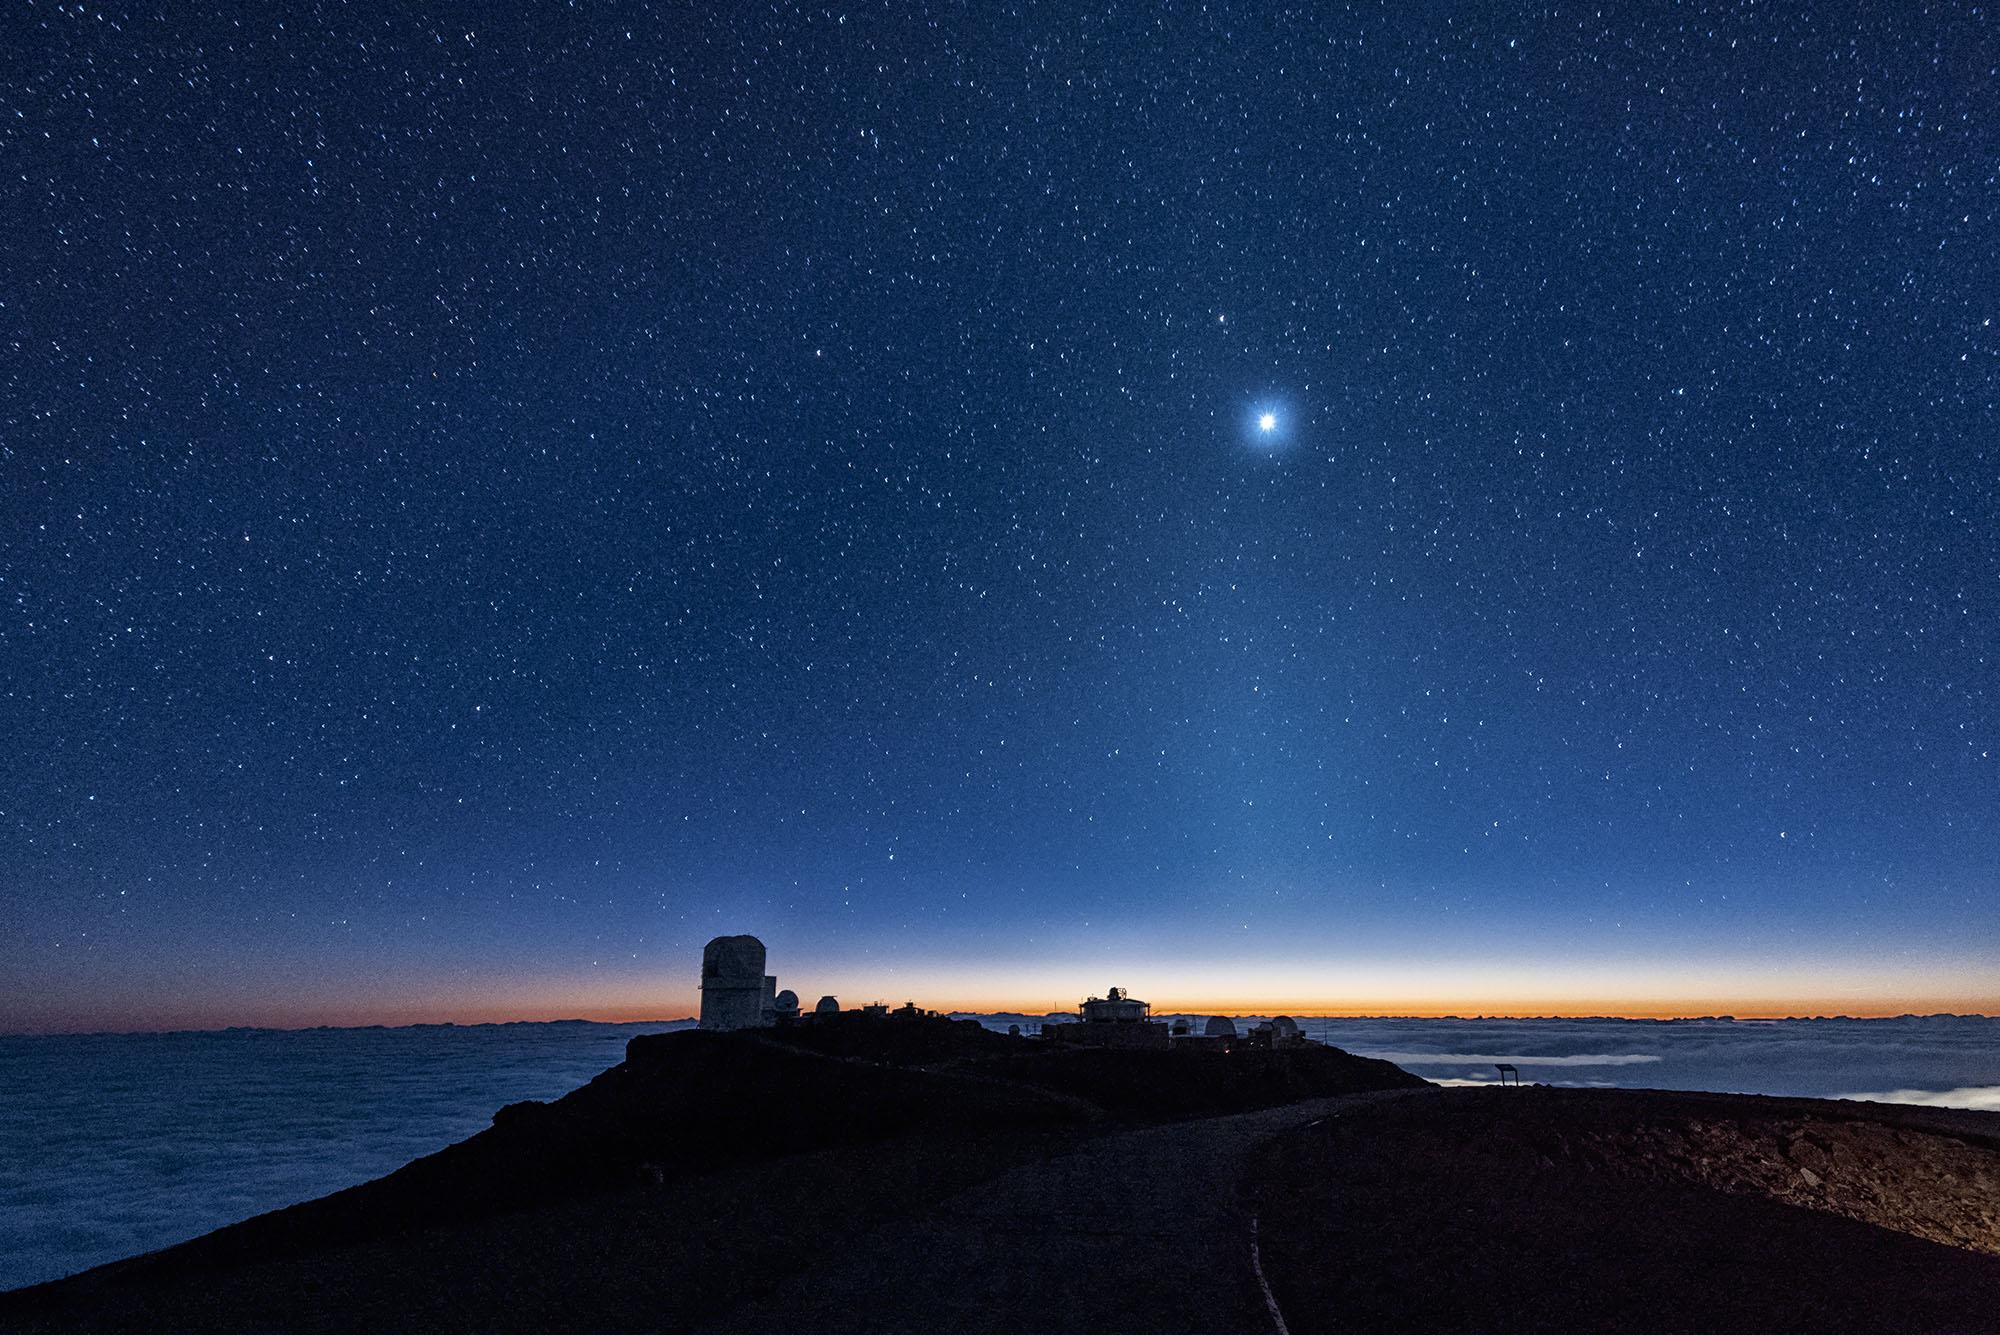 Venus: Exploration, Research and Colonization (Part V)